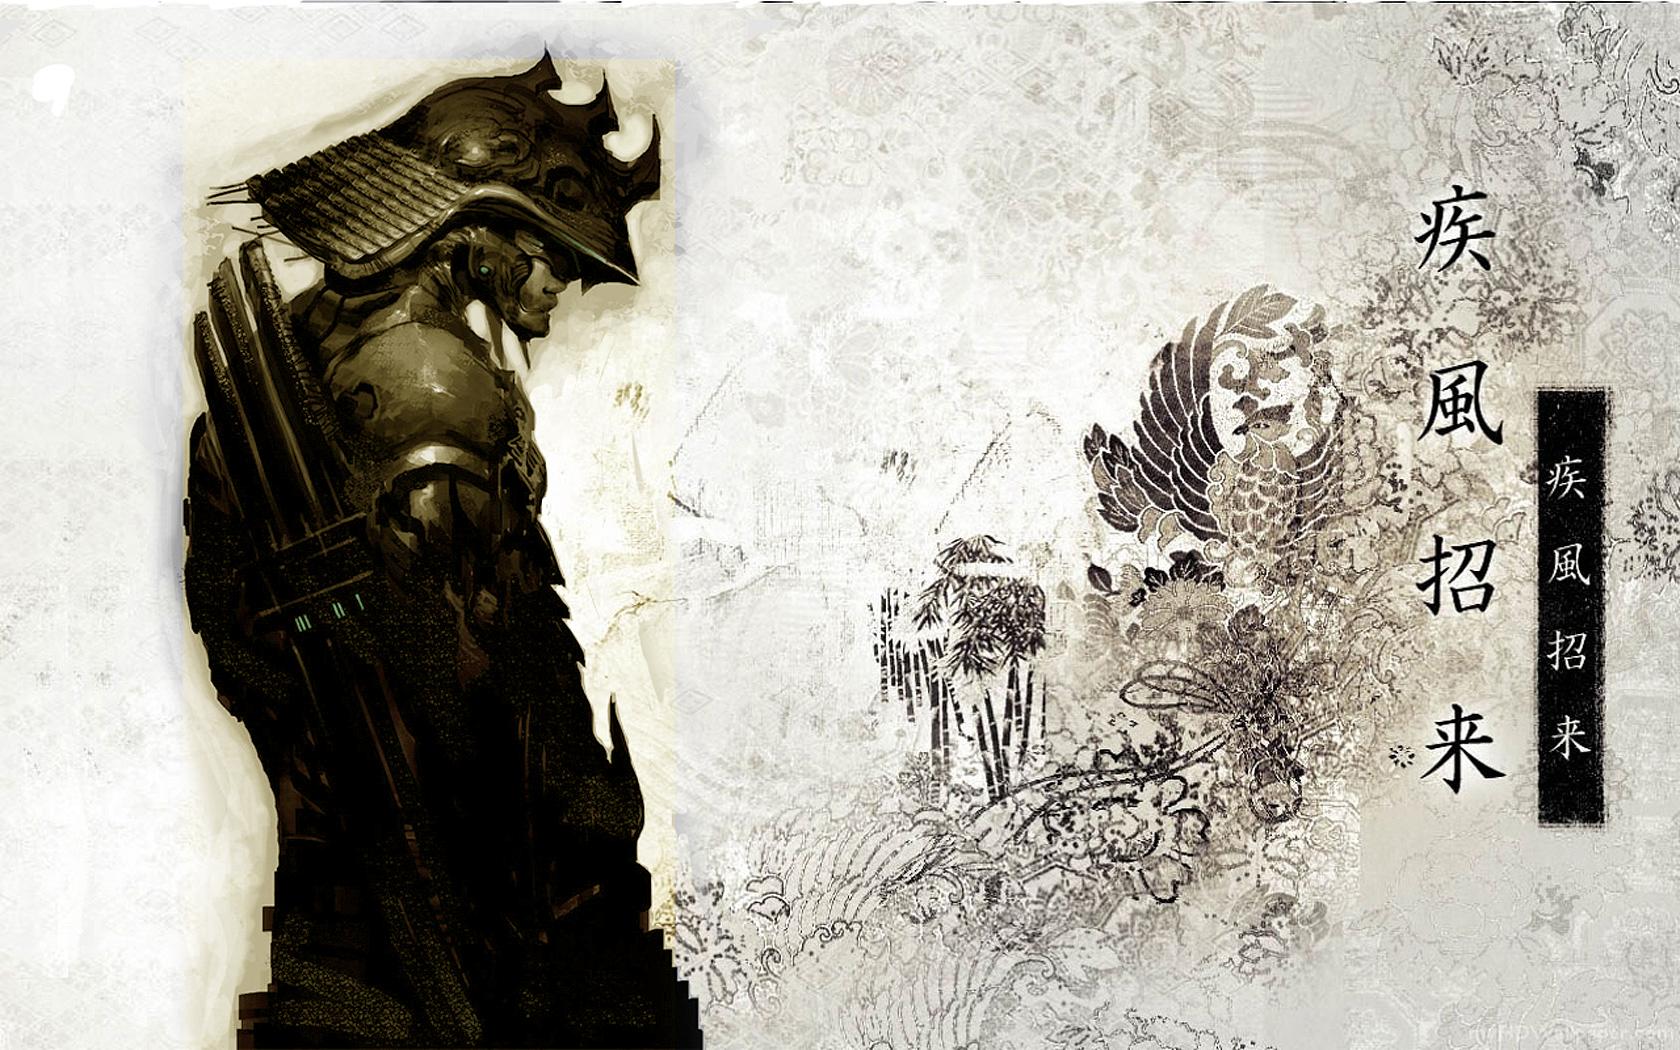 Samurai Japanese Wallpaper 1680x1050 Samurai Japanese 1680x1050